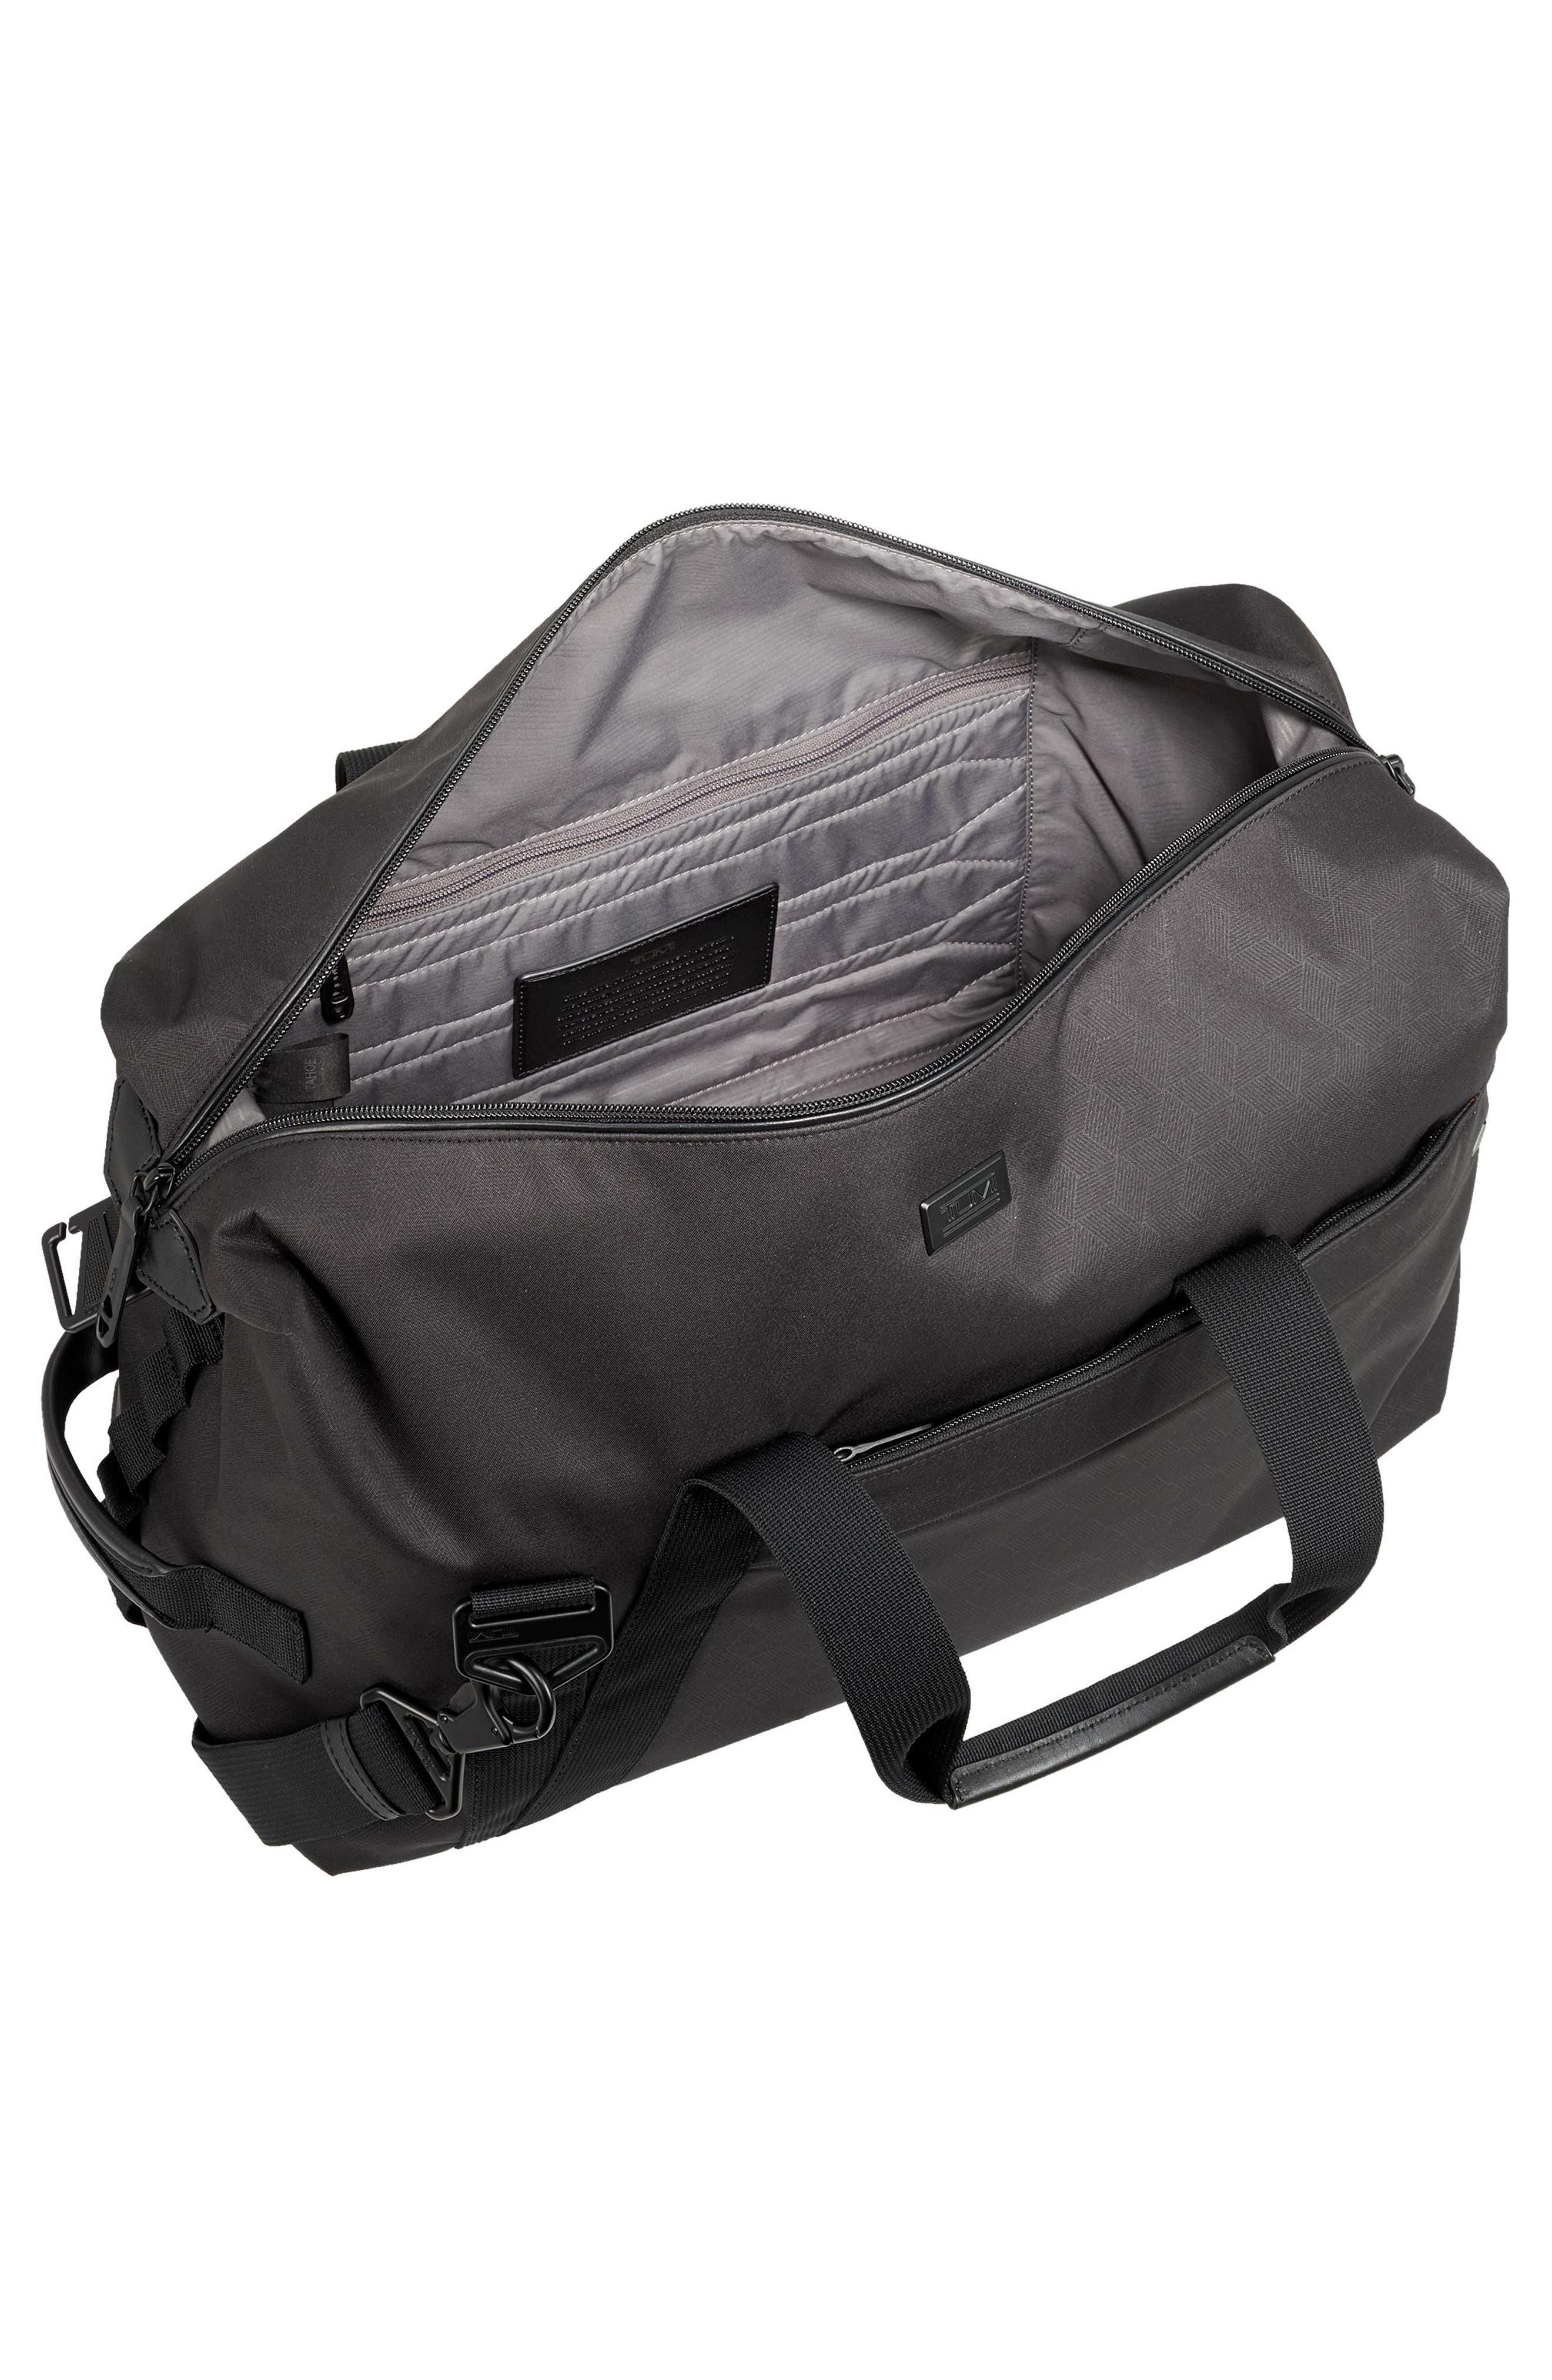 Sonoma Duffel Bag,                             Alternate thumbnail 3, color,                             BLACK